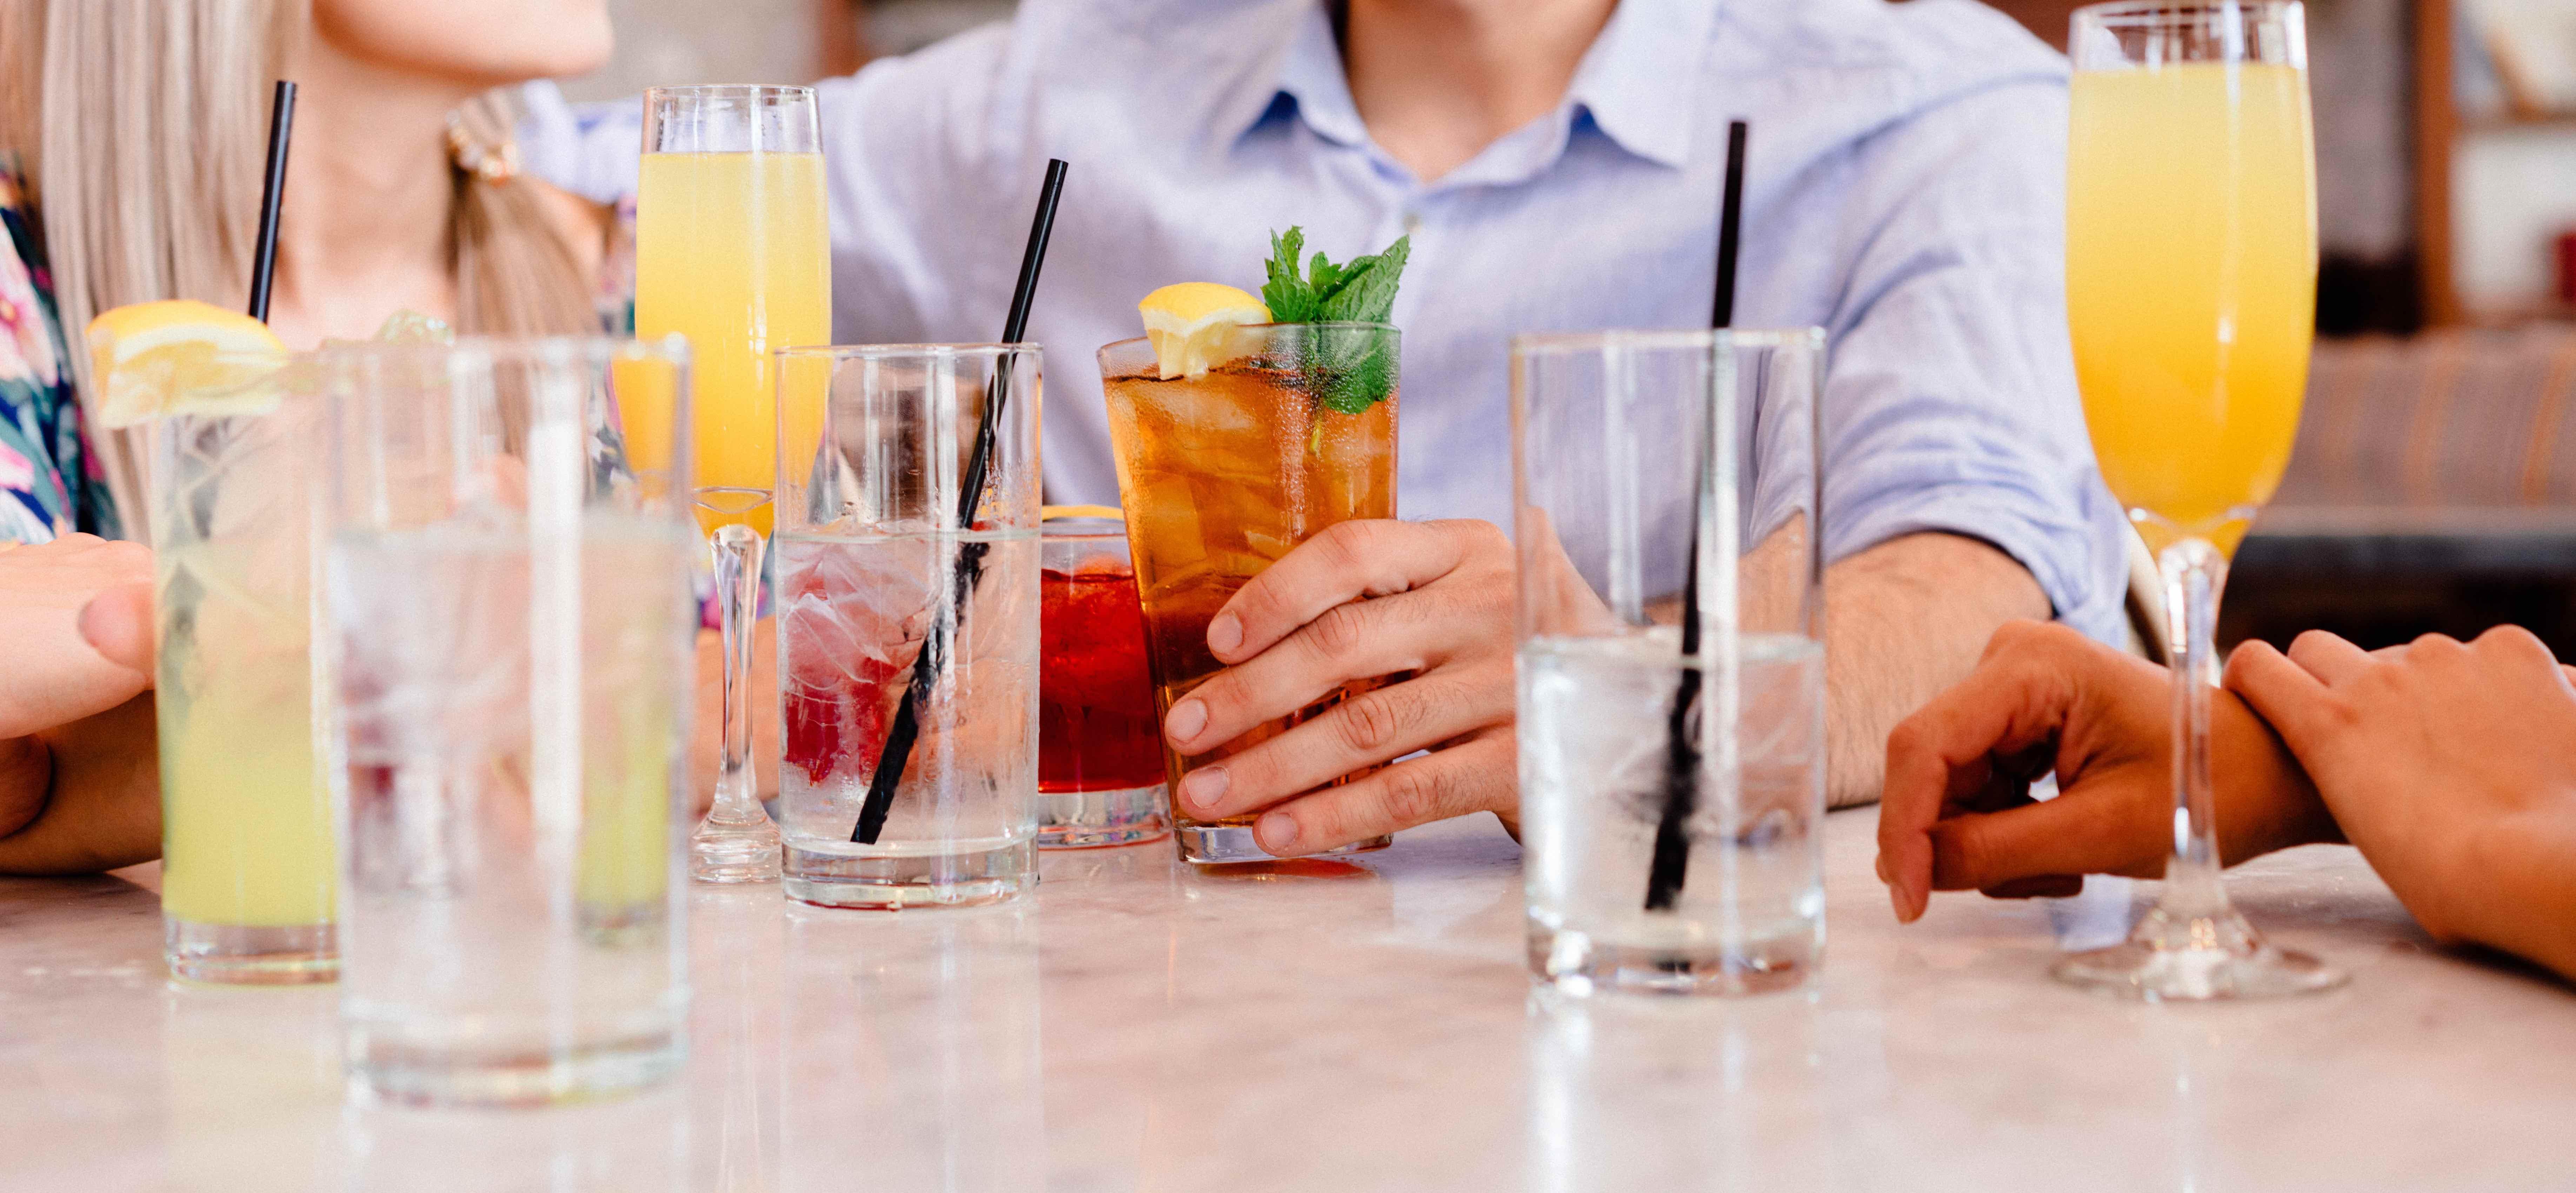 May Simpkin Nutrition Drinking Smart for Xmas